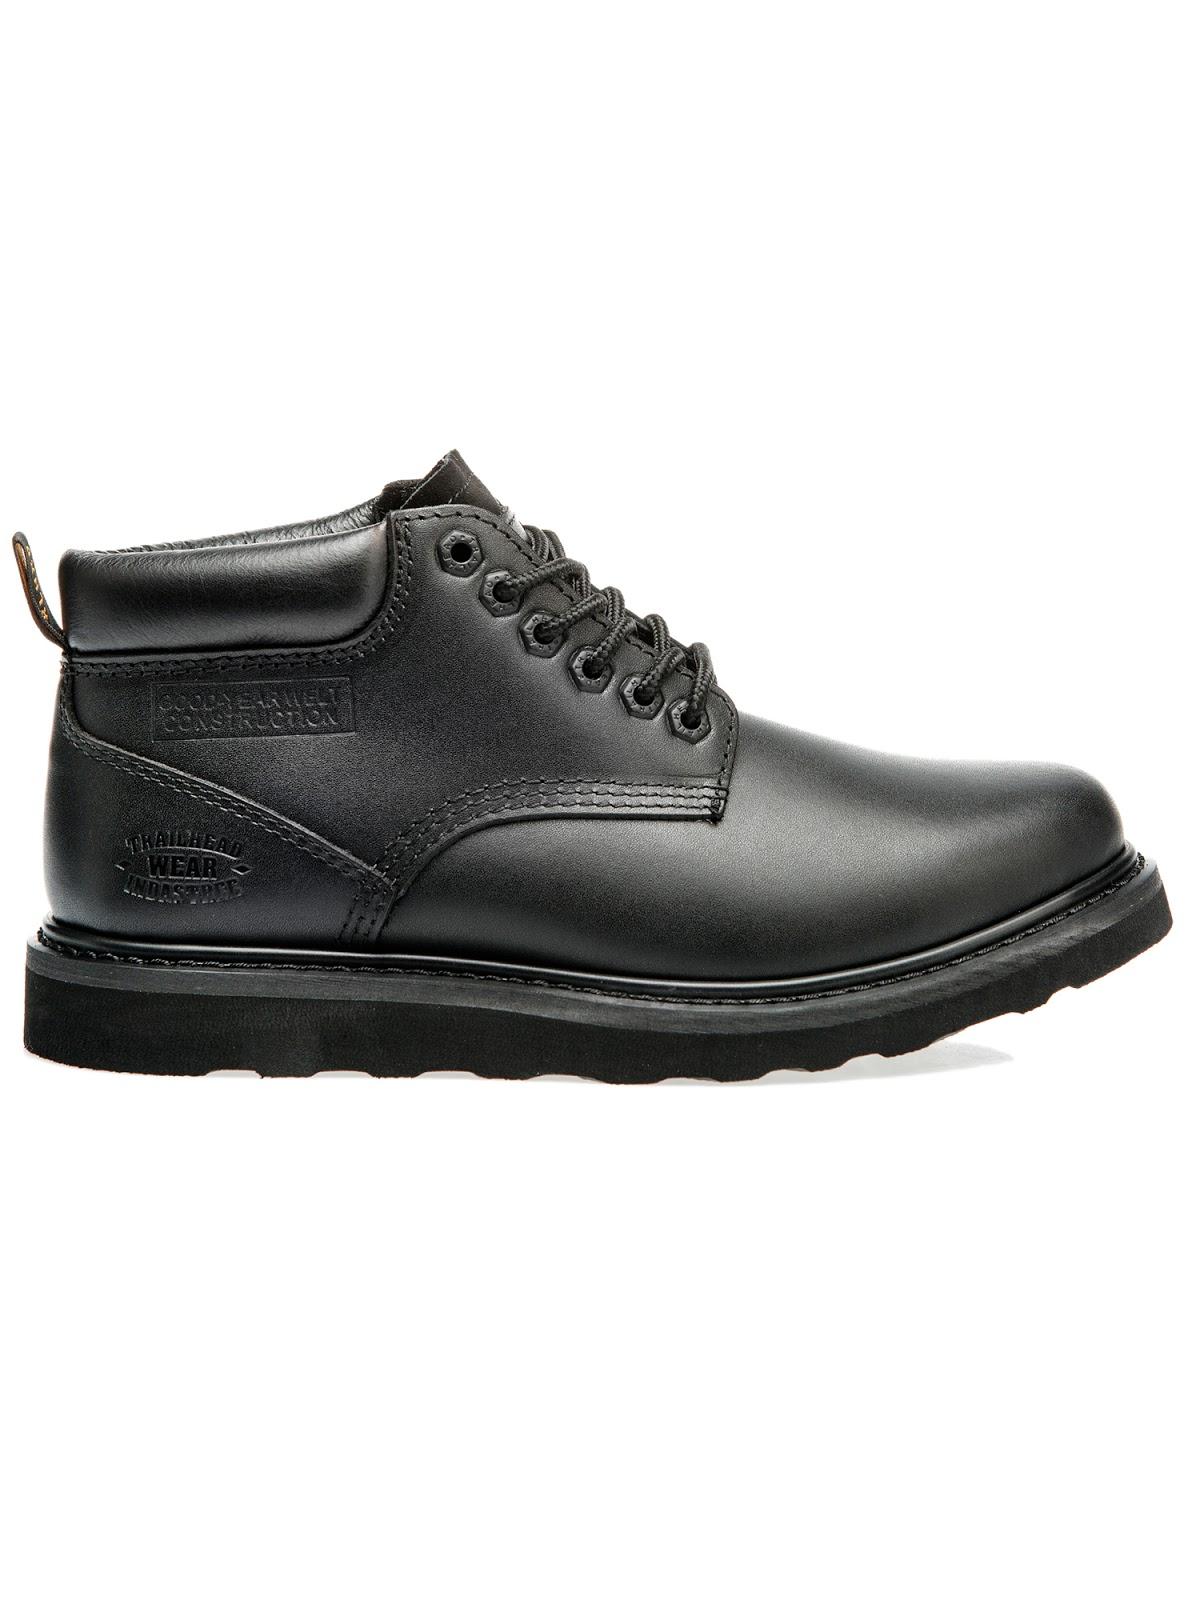 Ботинки Trailhead. 6EYE-BK e3ed4dc2eaed1